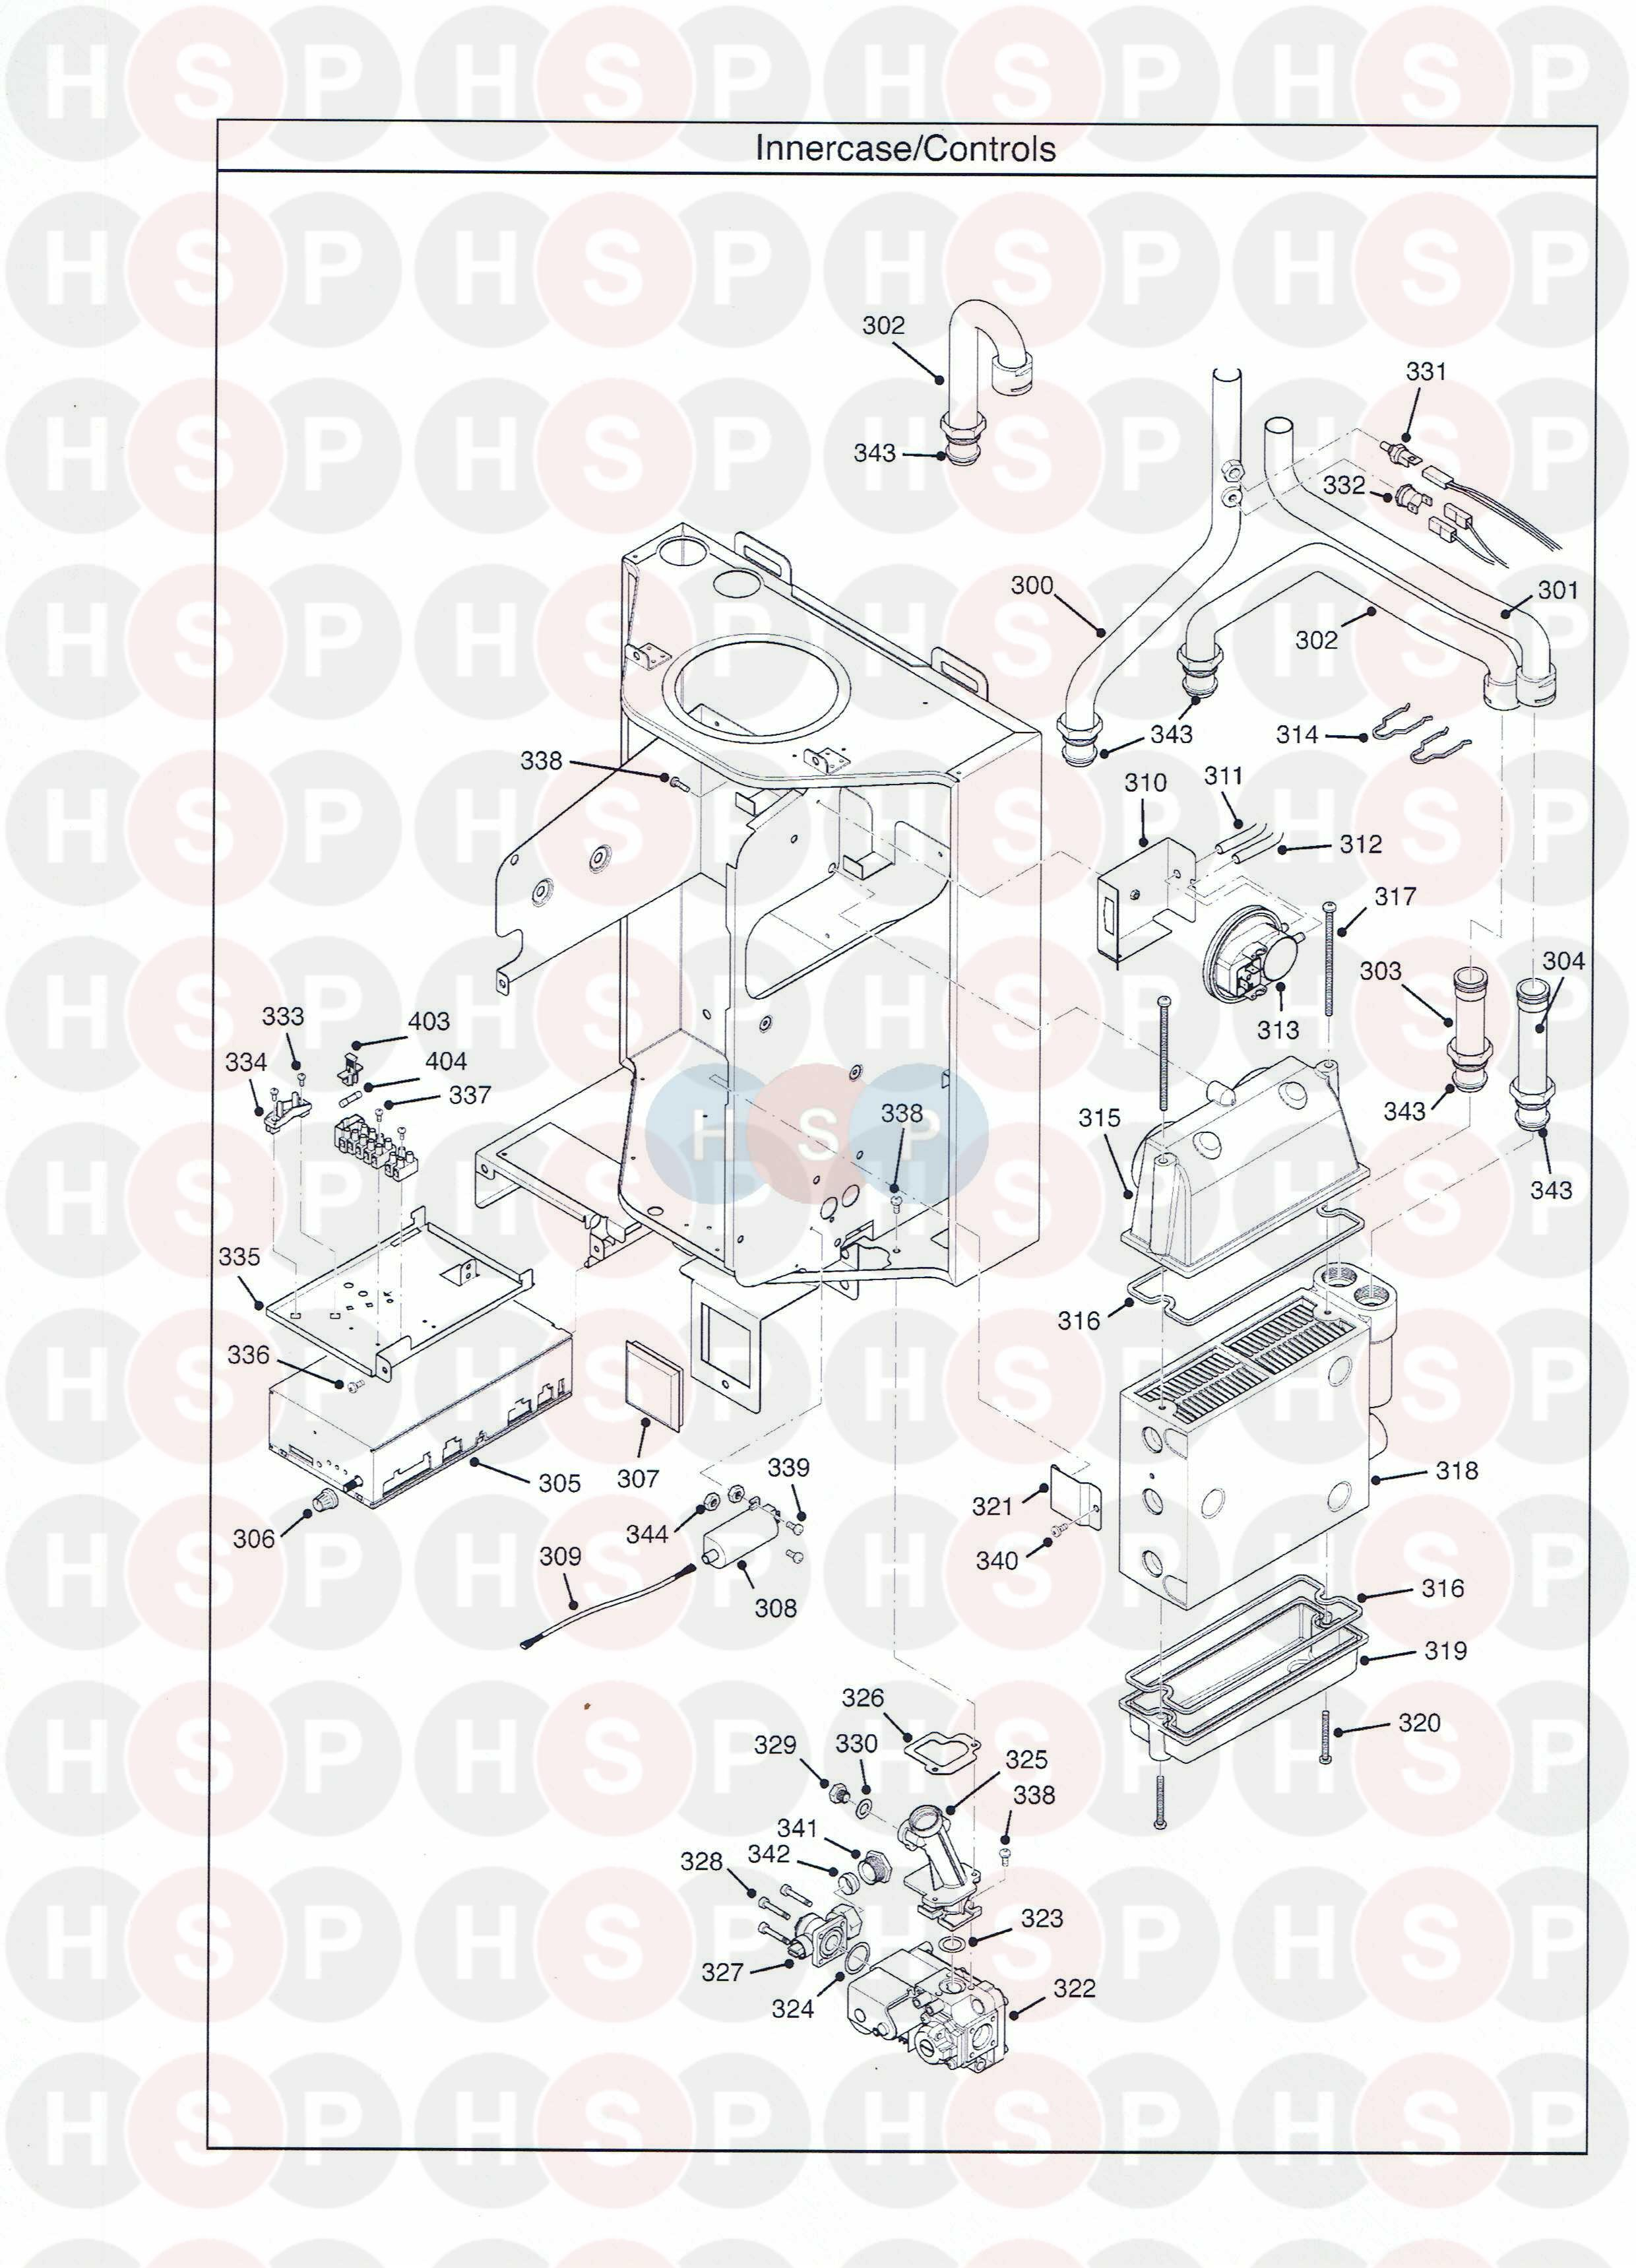 Potterton PERFORMA 18 SL Appliance Diagram (Inner Case